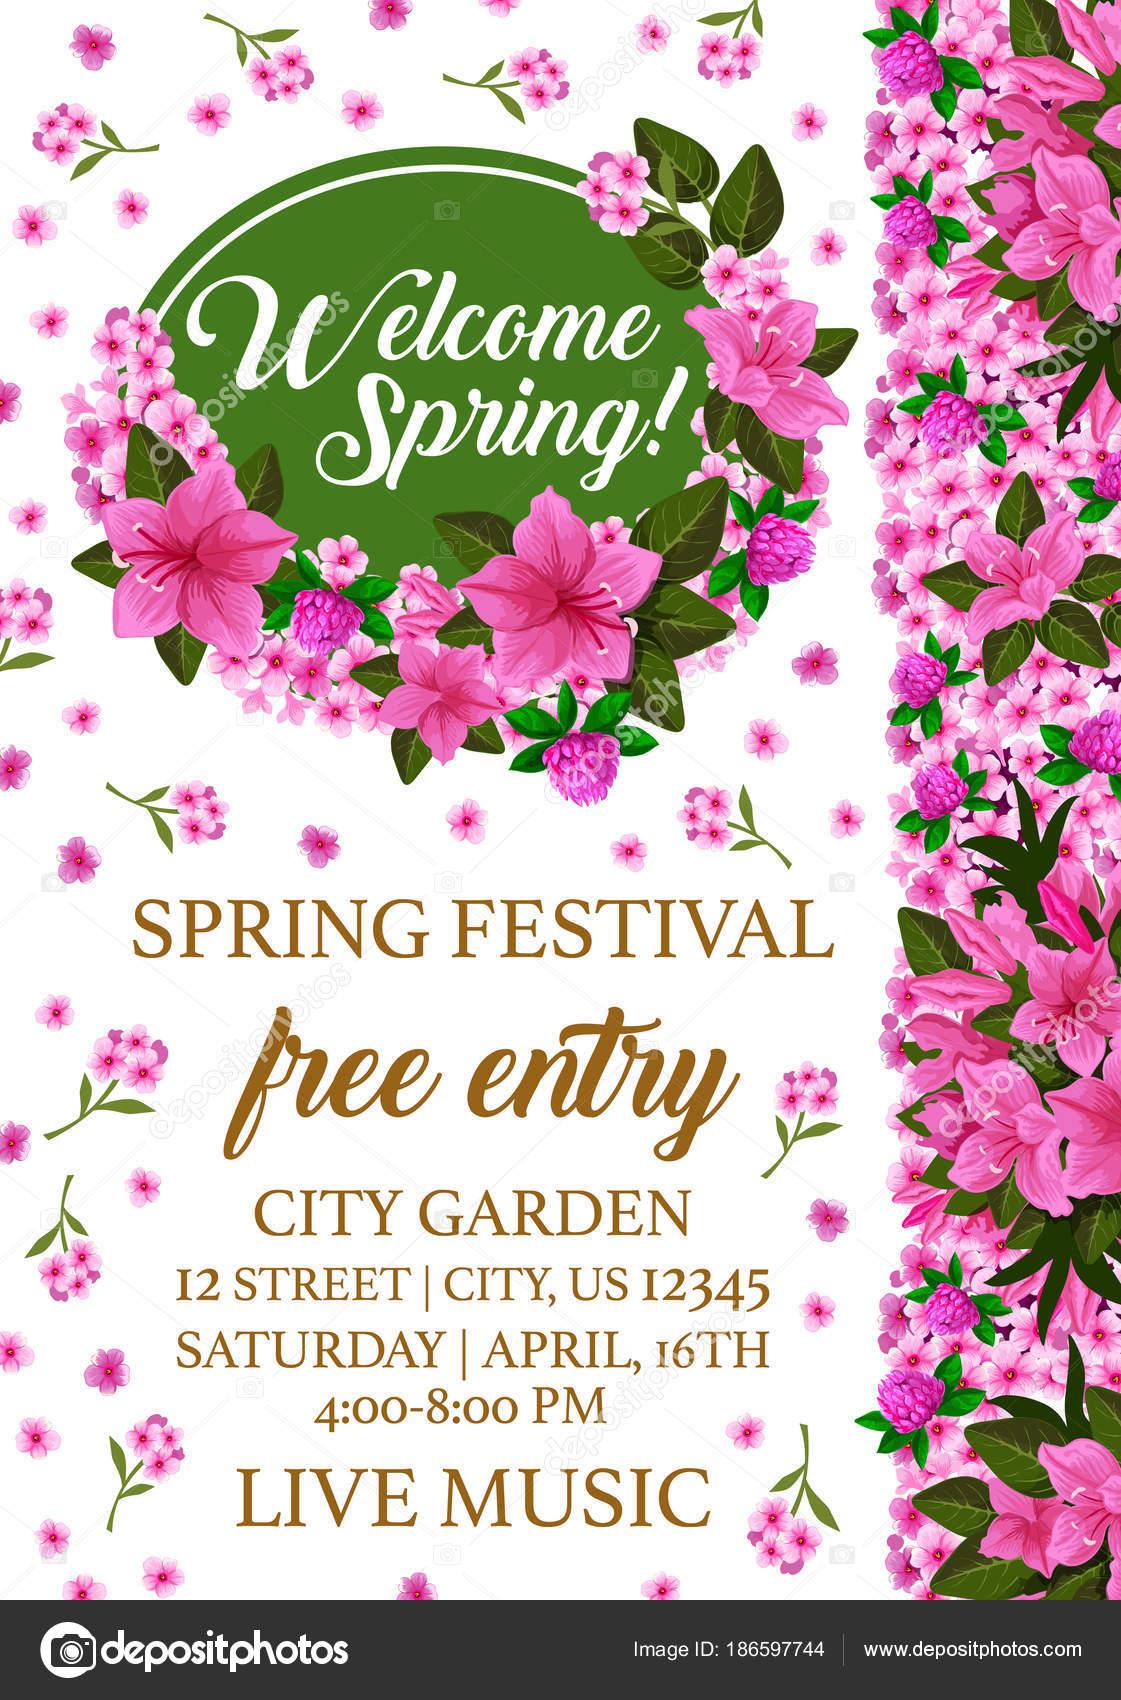 Cartaz Festival De Primavera Com Moldura De Flor De Rosa